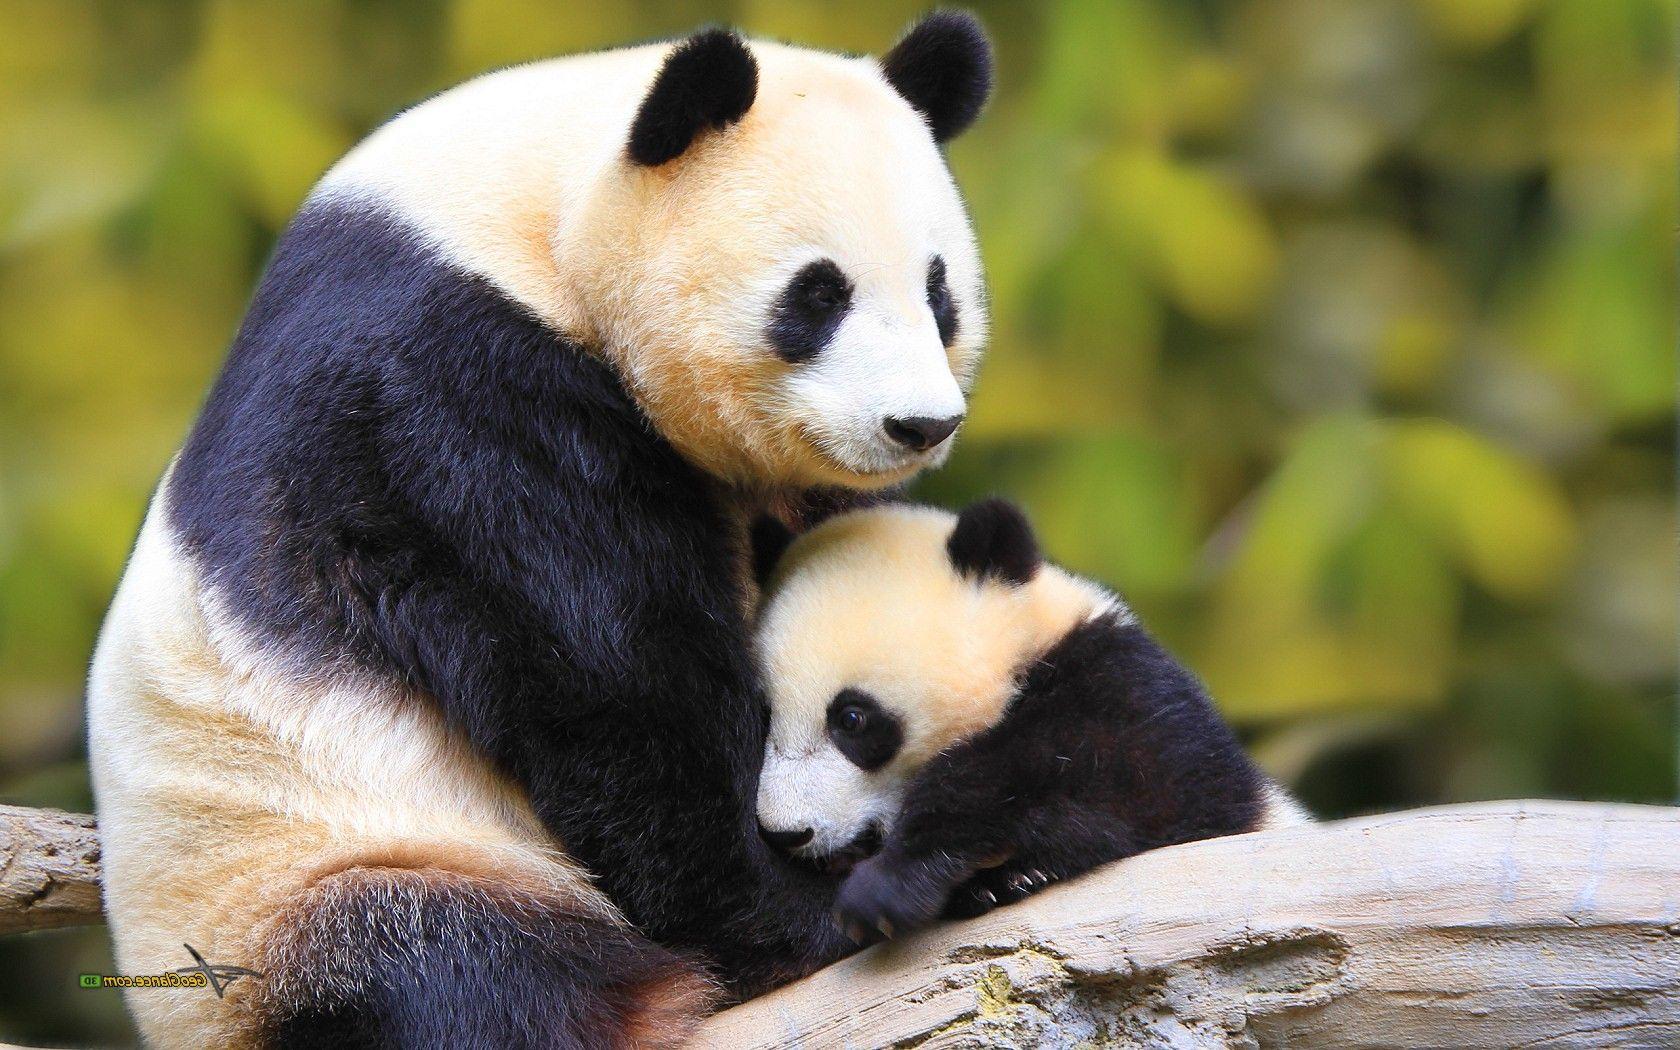 Cute Baby Panda 1680 1050 Panda Bear Baby Panda Baby Panda Bears